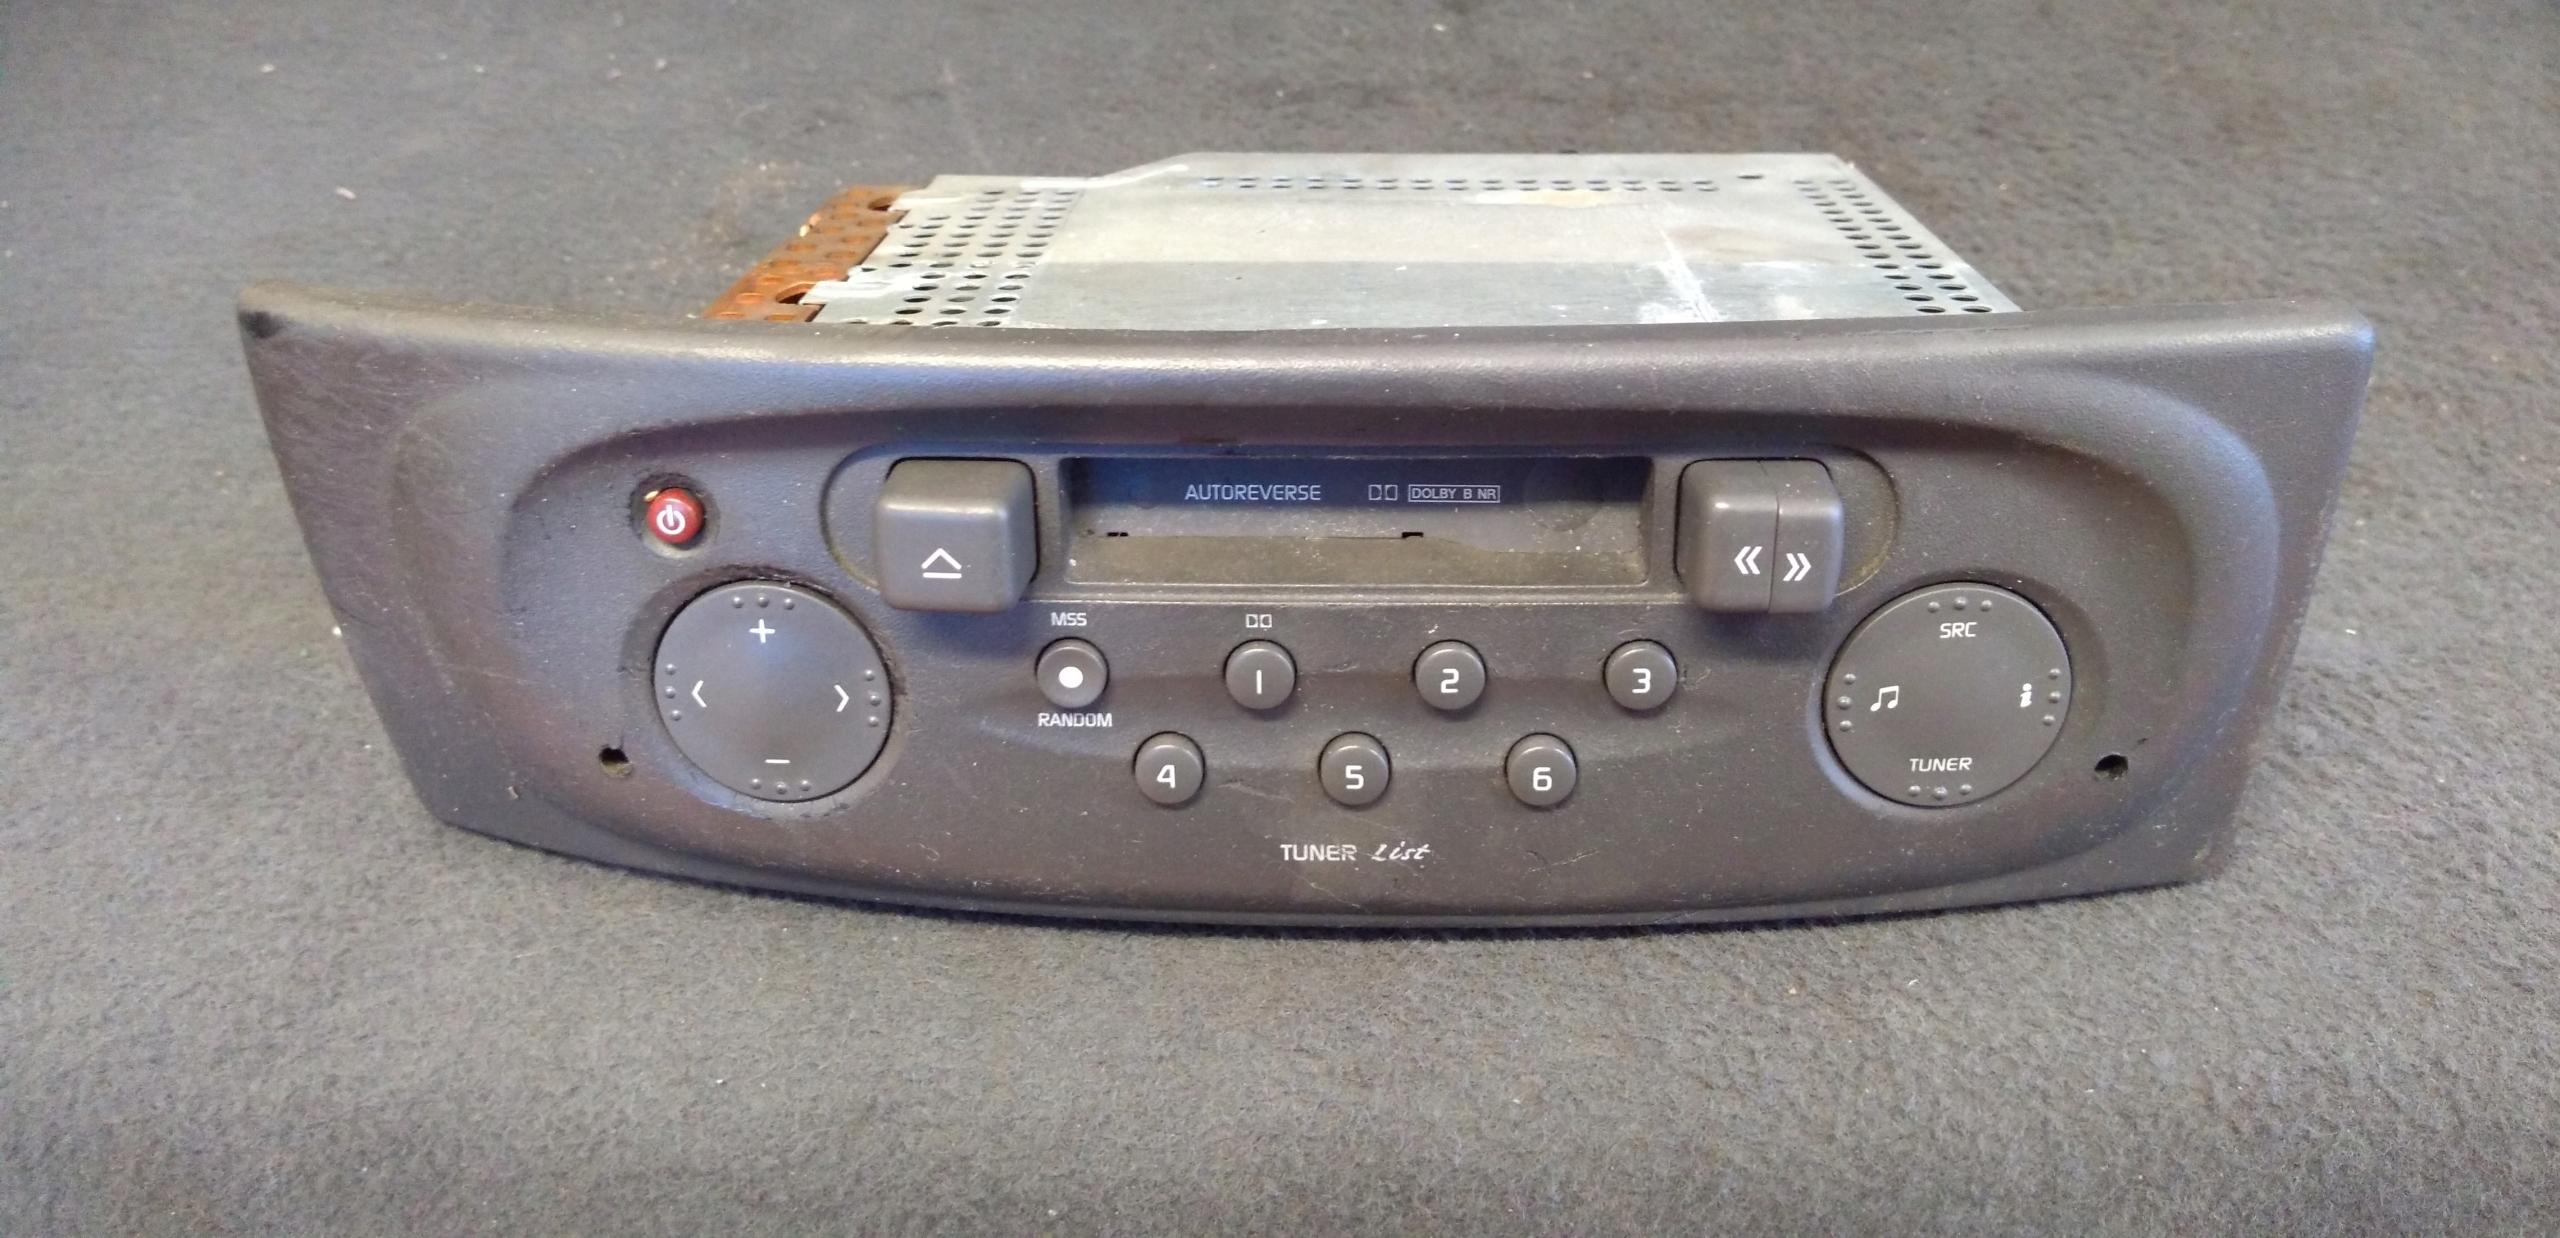 Radio Samochodowe Renault Megane Scenic 22dc258 7443571380